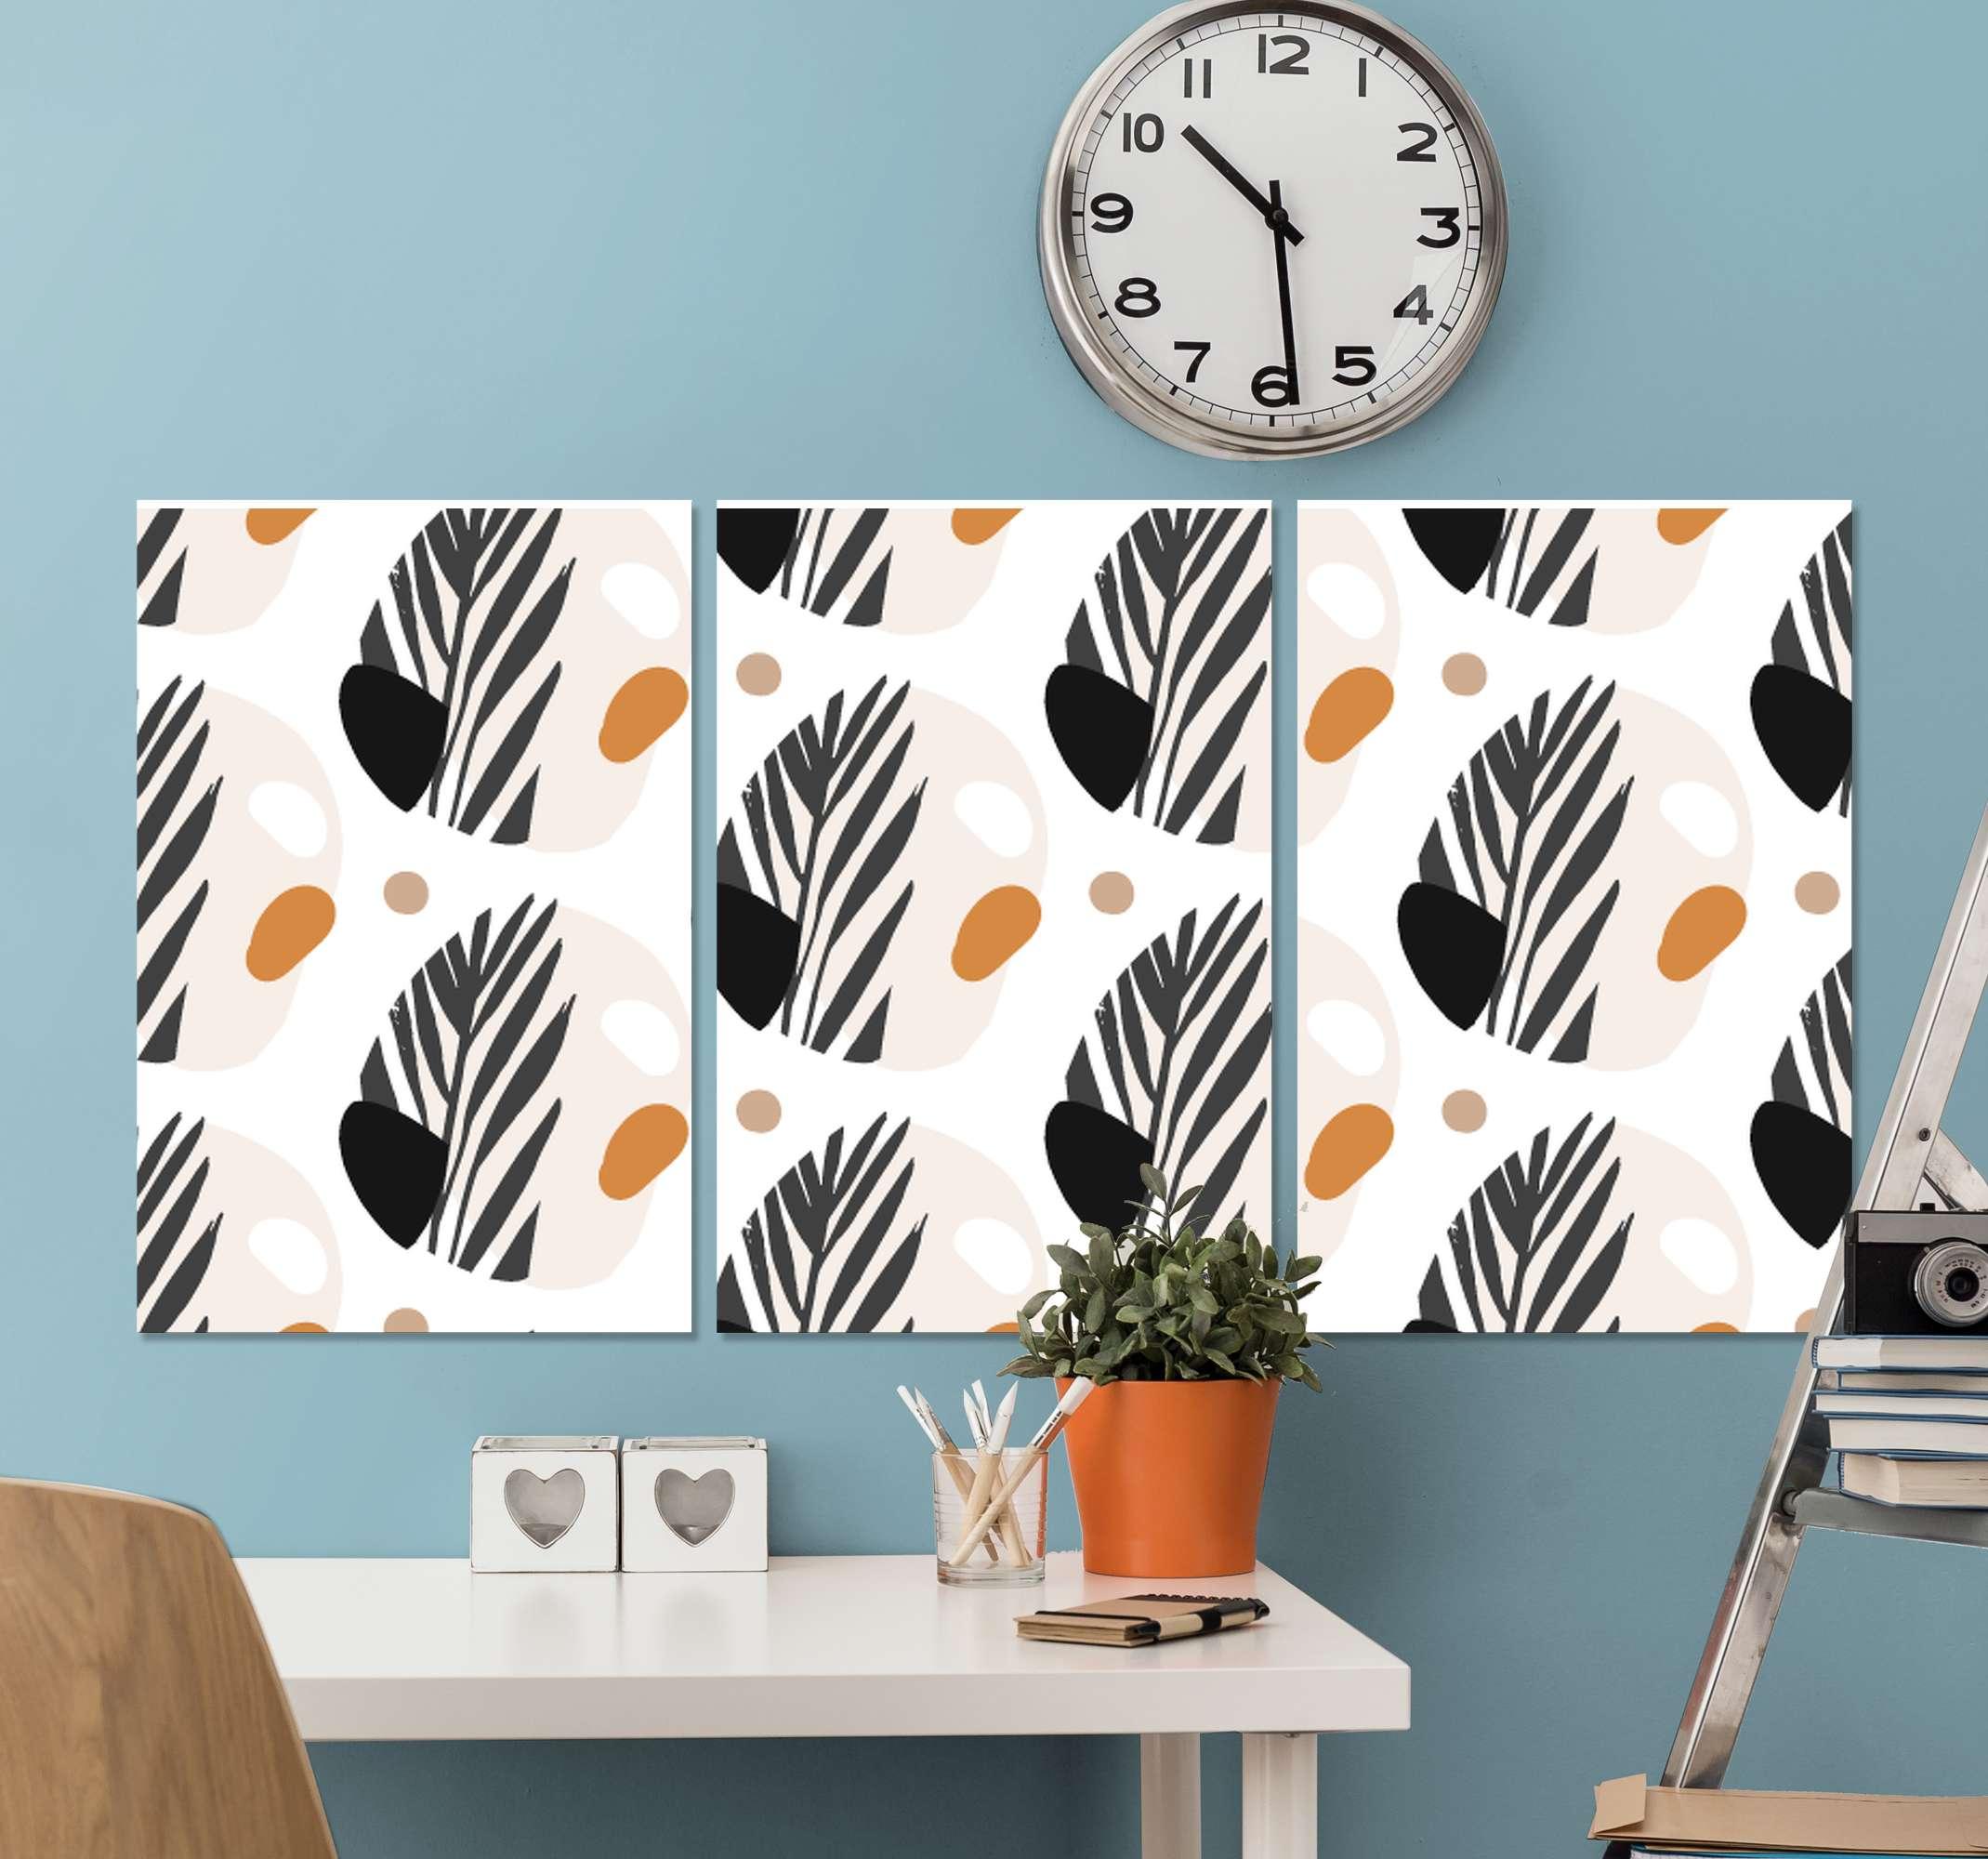 TenStickers. αφηρημένη σκανδιναβική τέχνη καμβά. σκανδιναβική εκτύπωση καμβά που διαθέτει μοτίβο αφηρημένων σχημάτων σε μαύρο, πορτοκαλί, καφέ, γκρι και λευκό. διαθέσιμες εκπτώσεις.